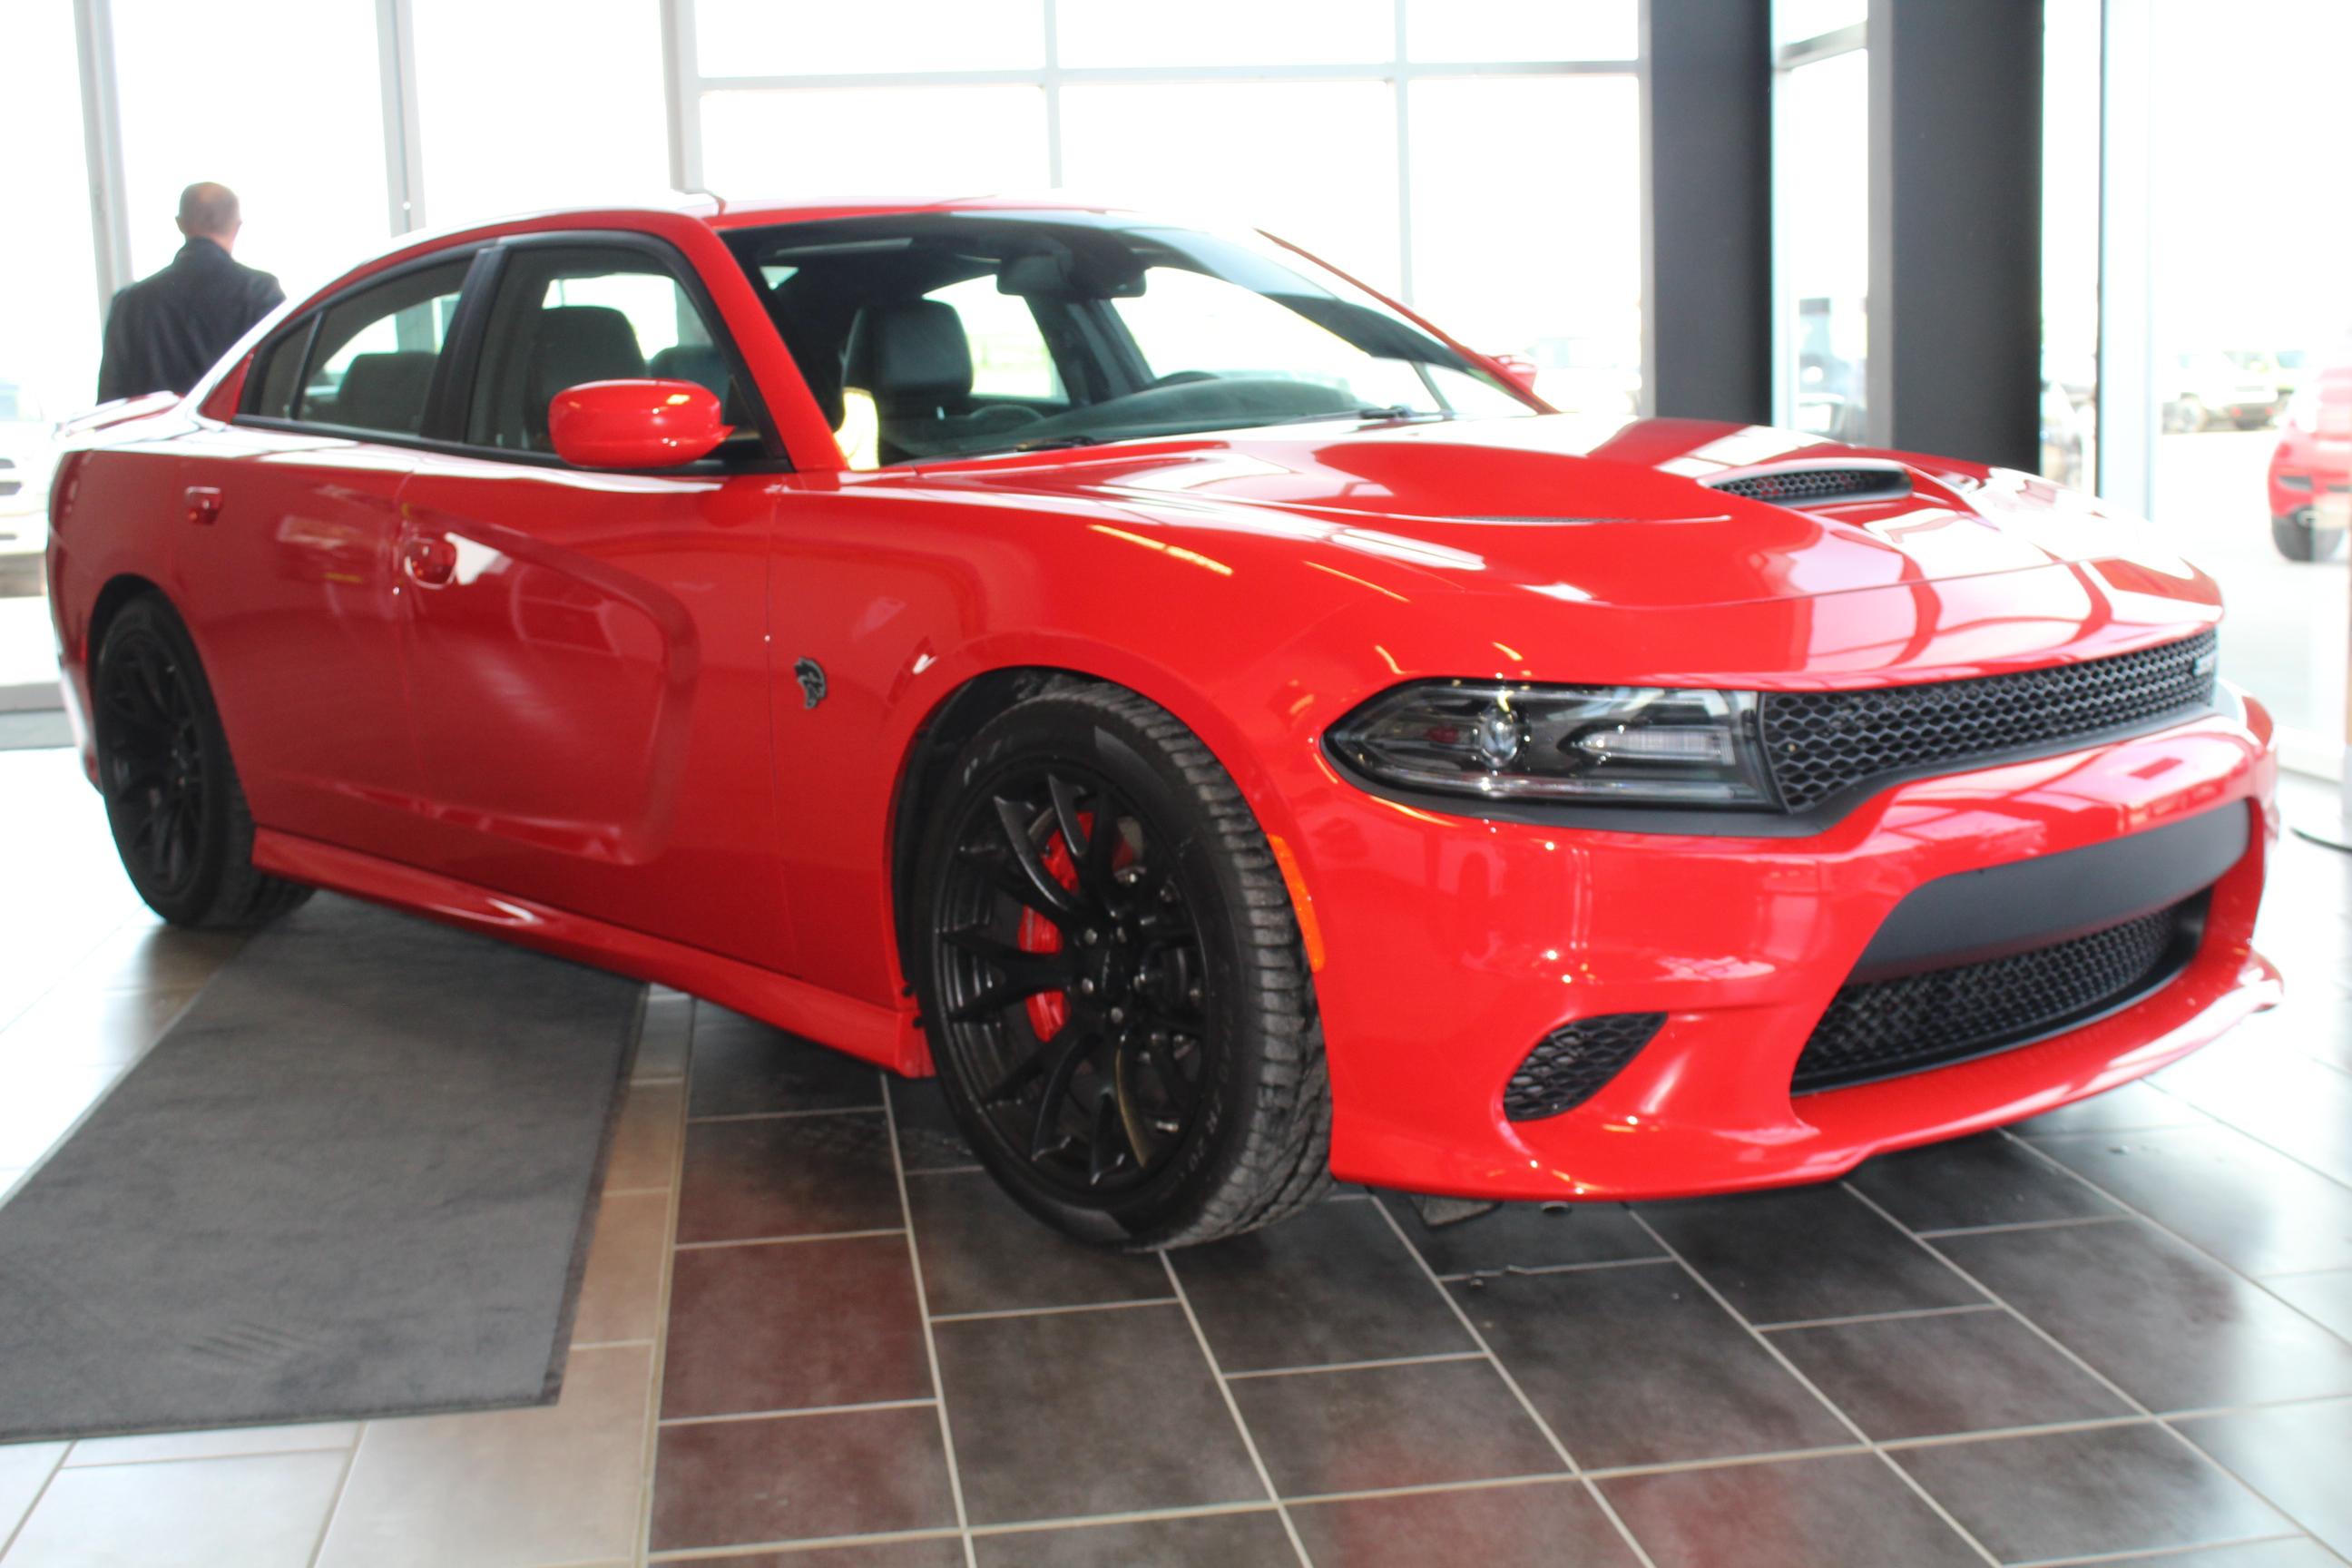 dodge hellcat for sale alberta 2015 Dodge Charger Hellcat - Okotoks Collector Car